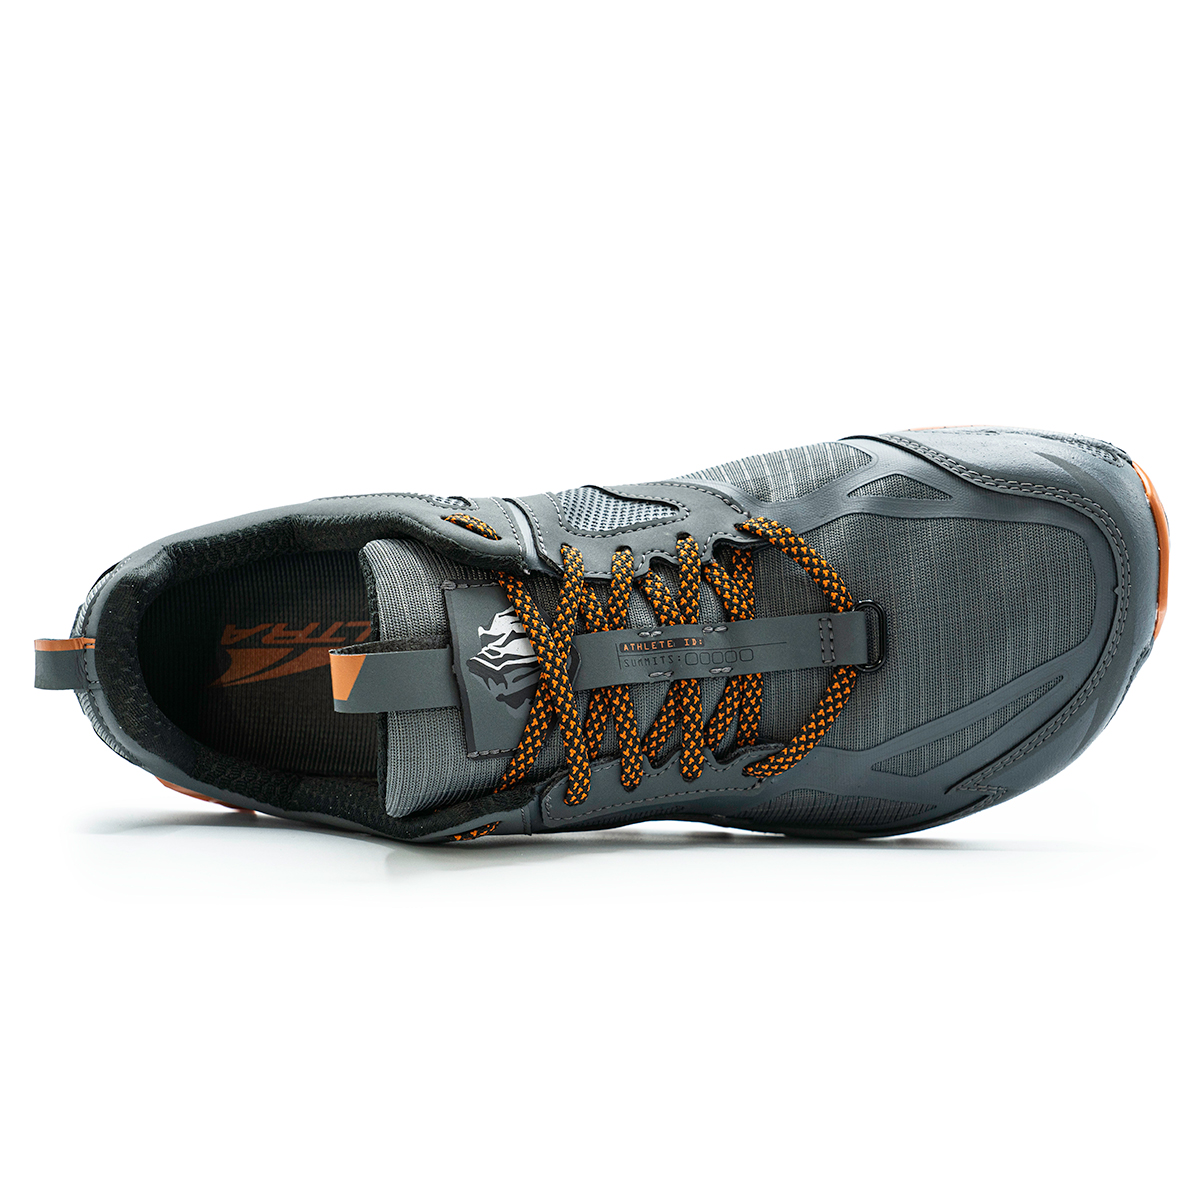 Men's Altra Lone Peak 4.5 Low Trail Running Shoe - Color: Gray/Orange - Size: 10 - Width: Regular, Gray/Orange, large, image 3